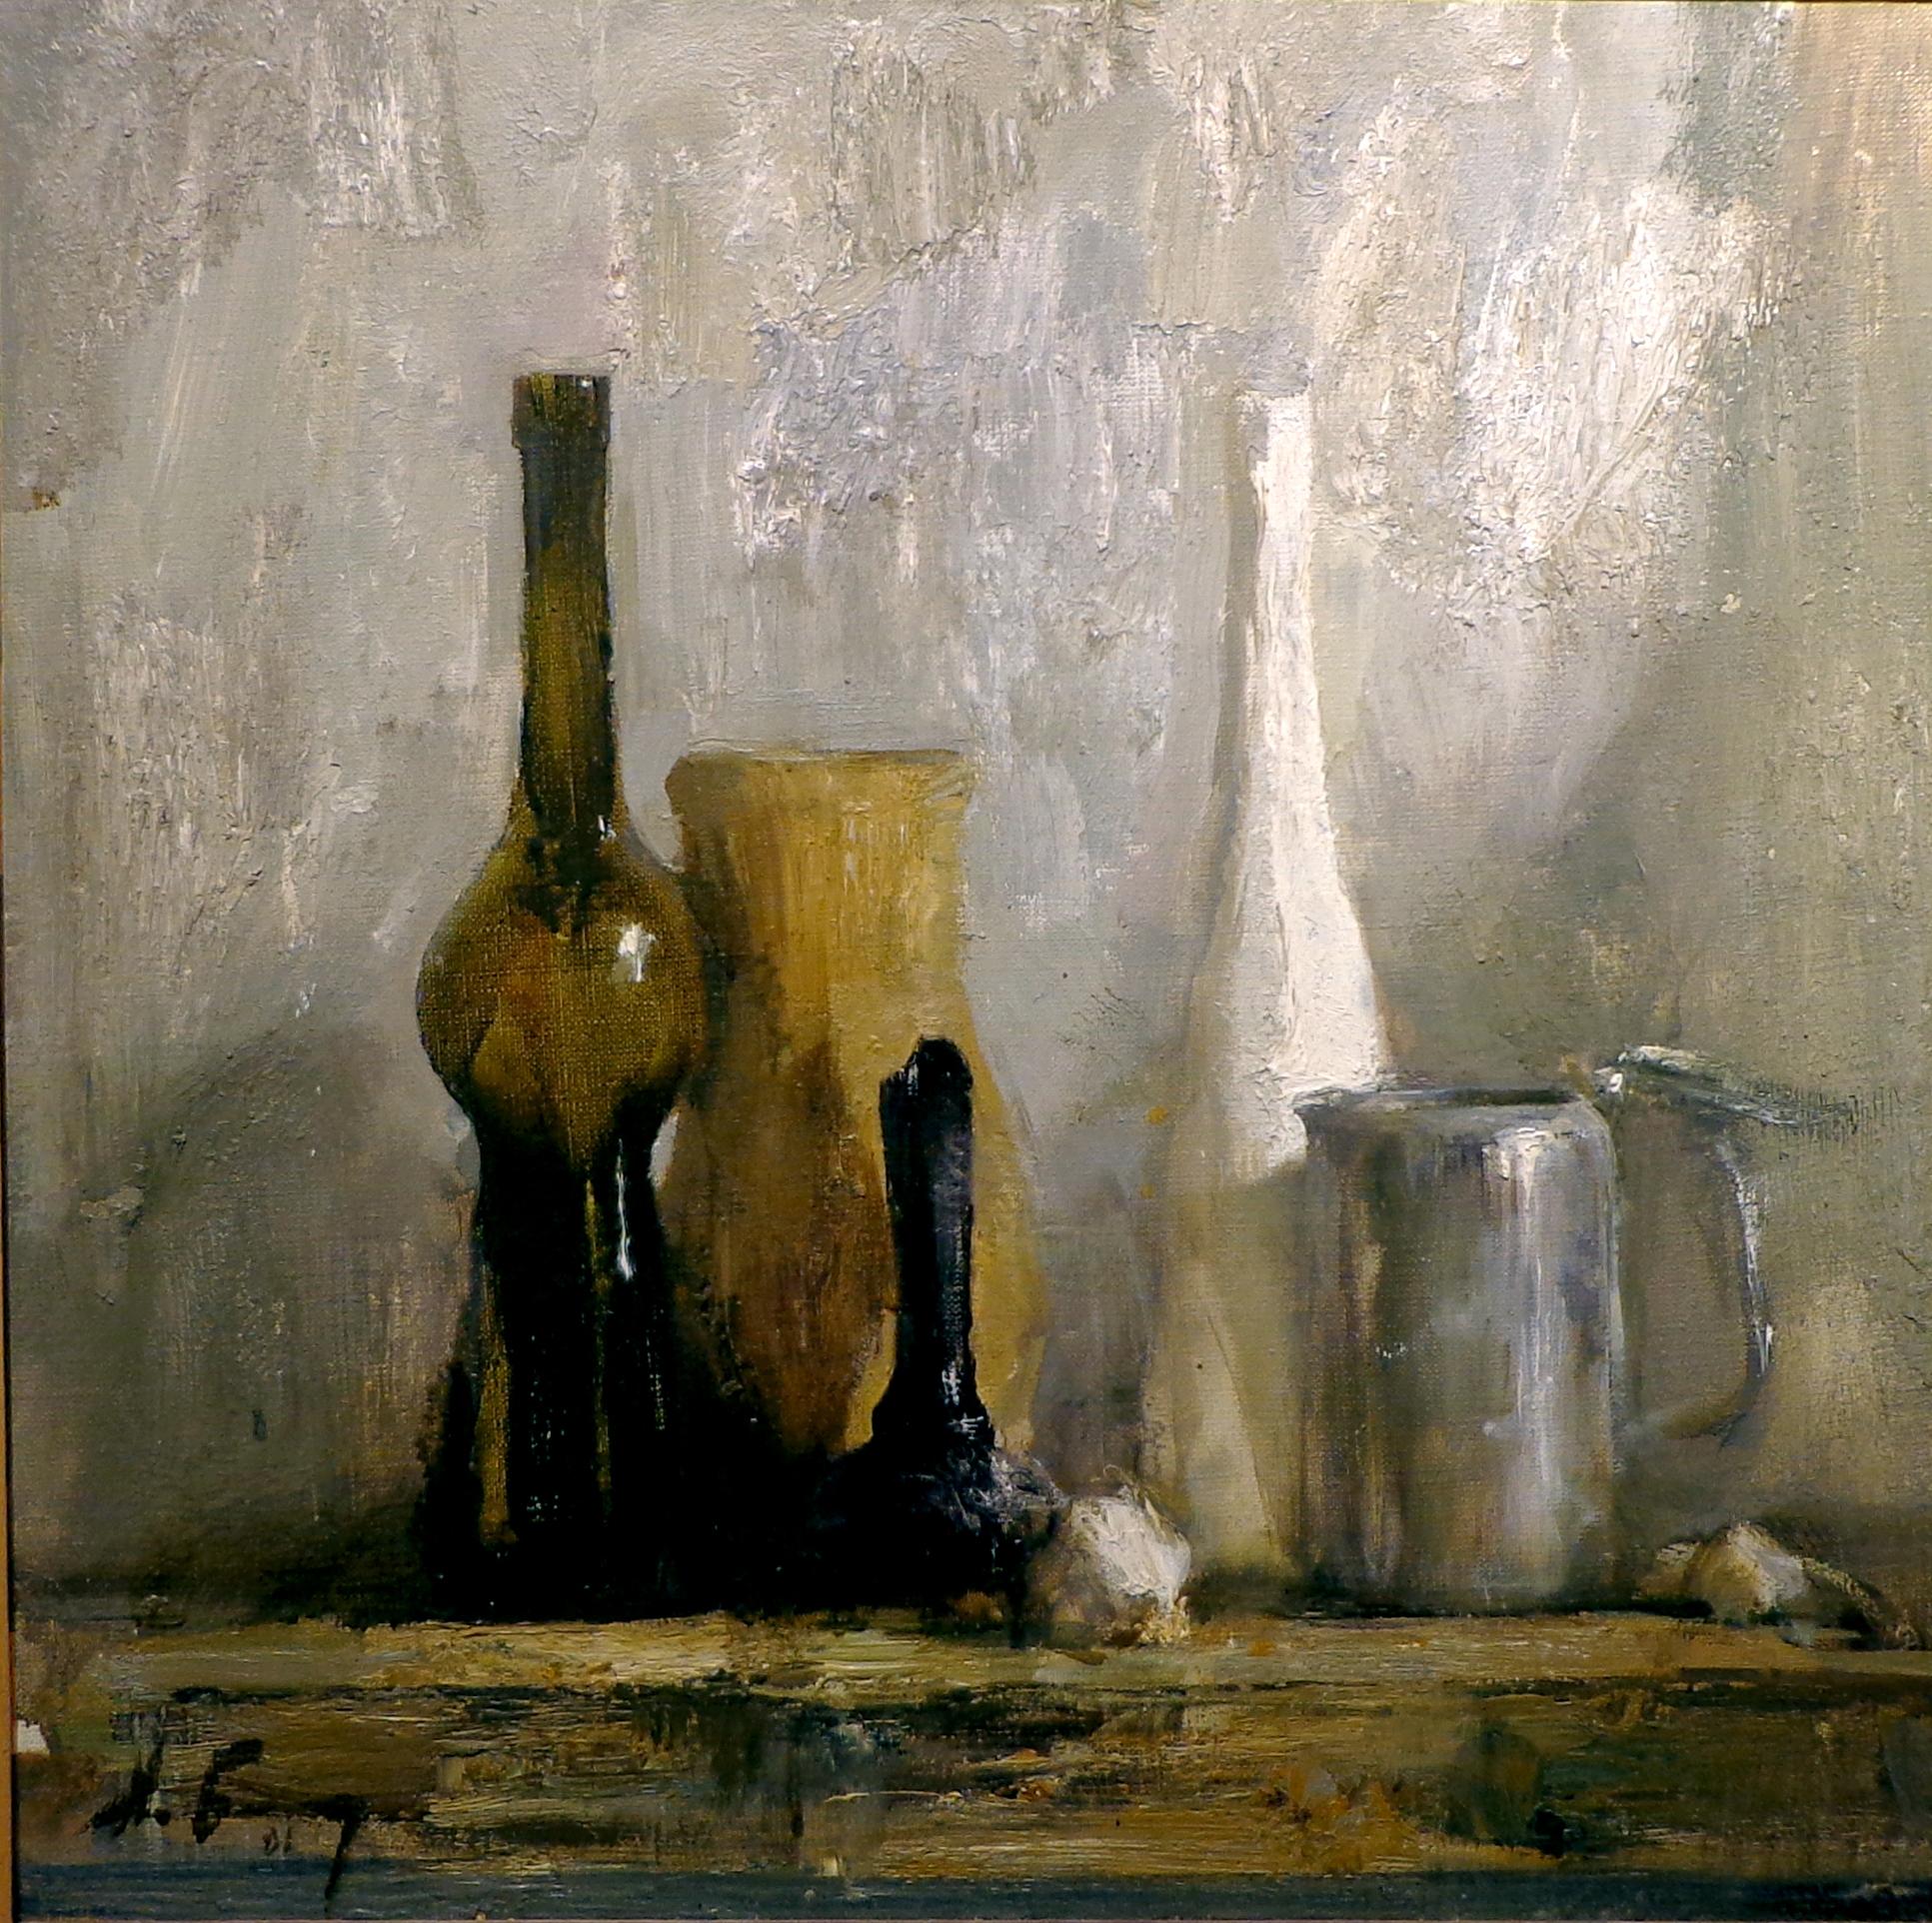 Blokhin, Still Life with Bottle